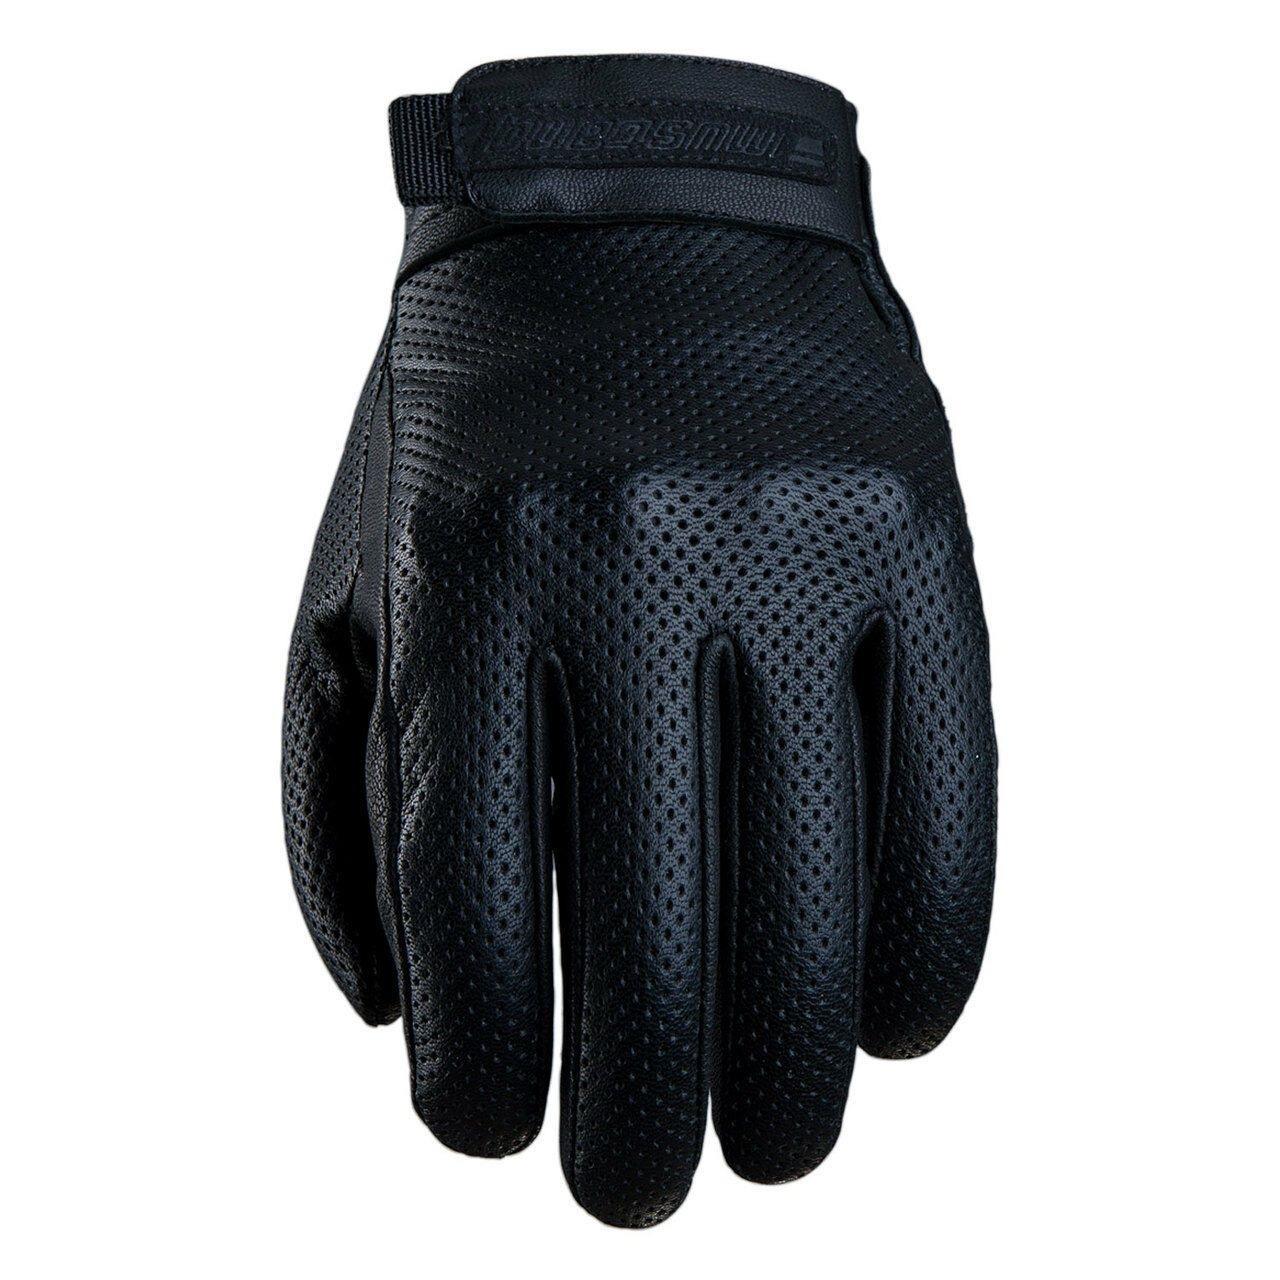 Five Mustang Vented Black Gloves